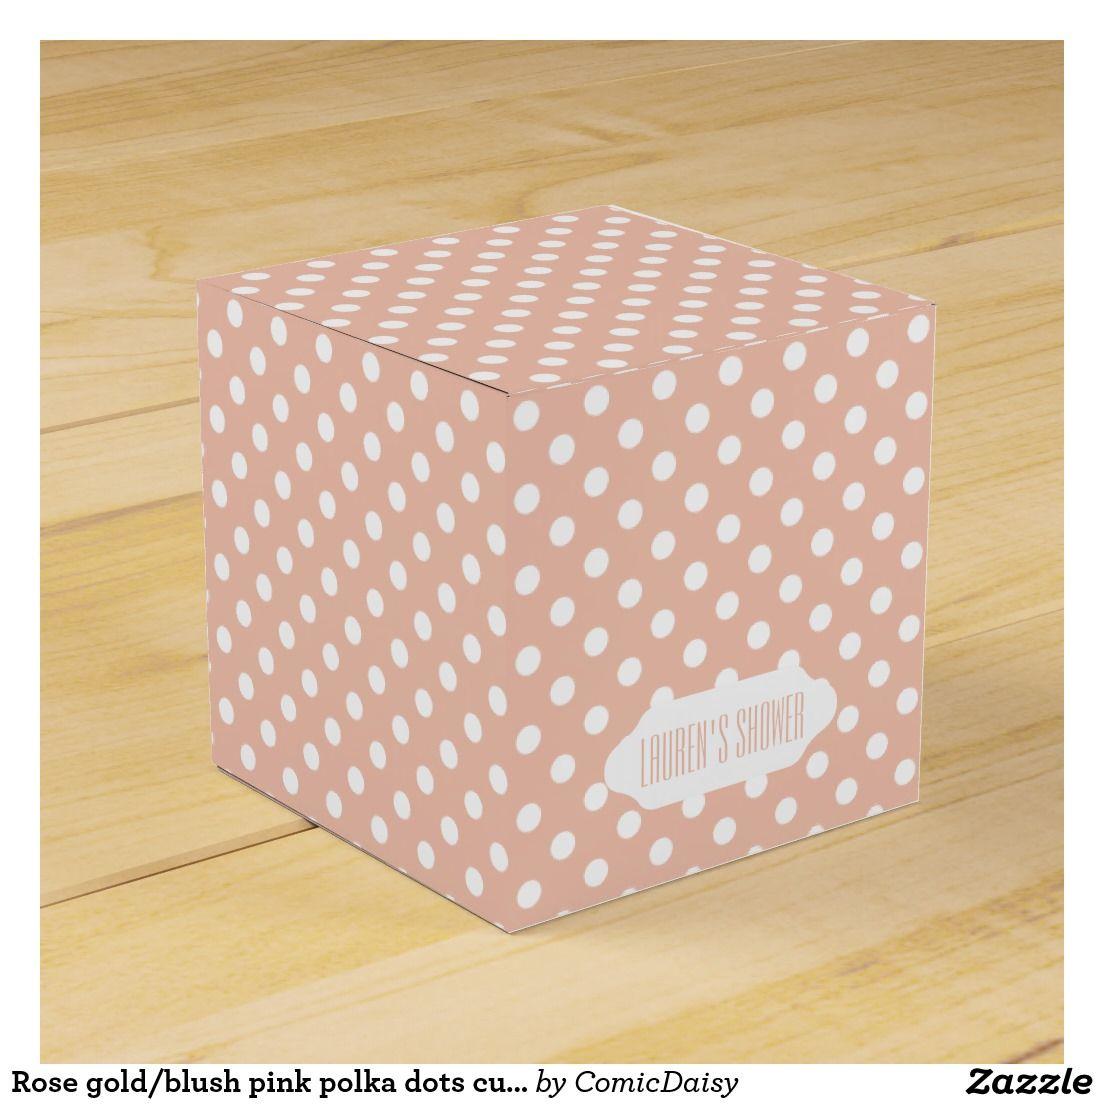 Rose gold/blush pink polka dots custom favor box | Pinterest | Blush ...